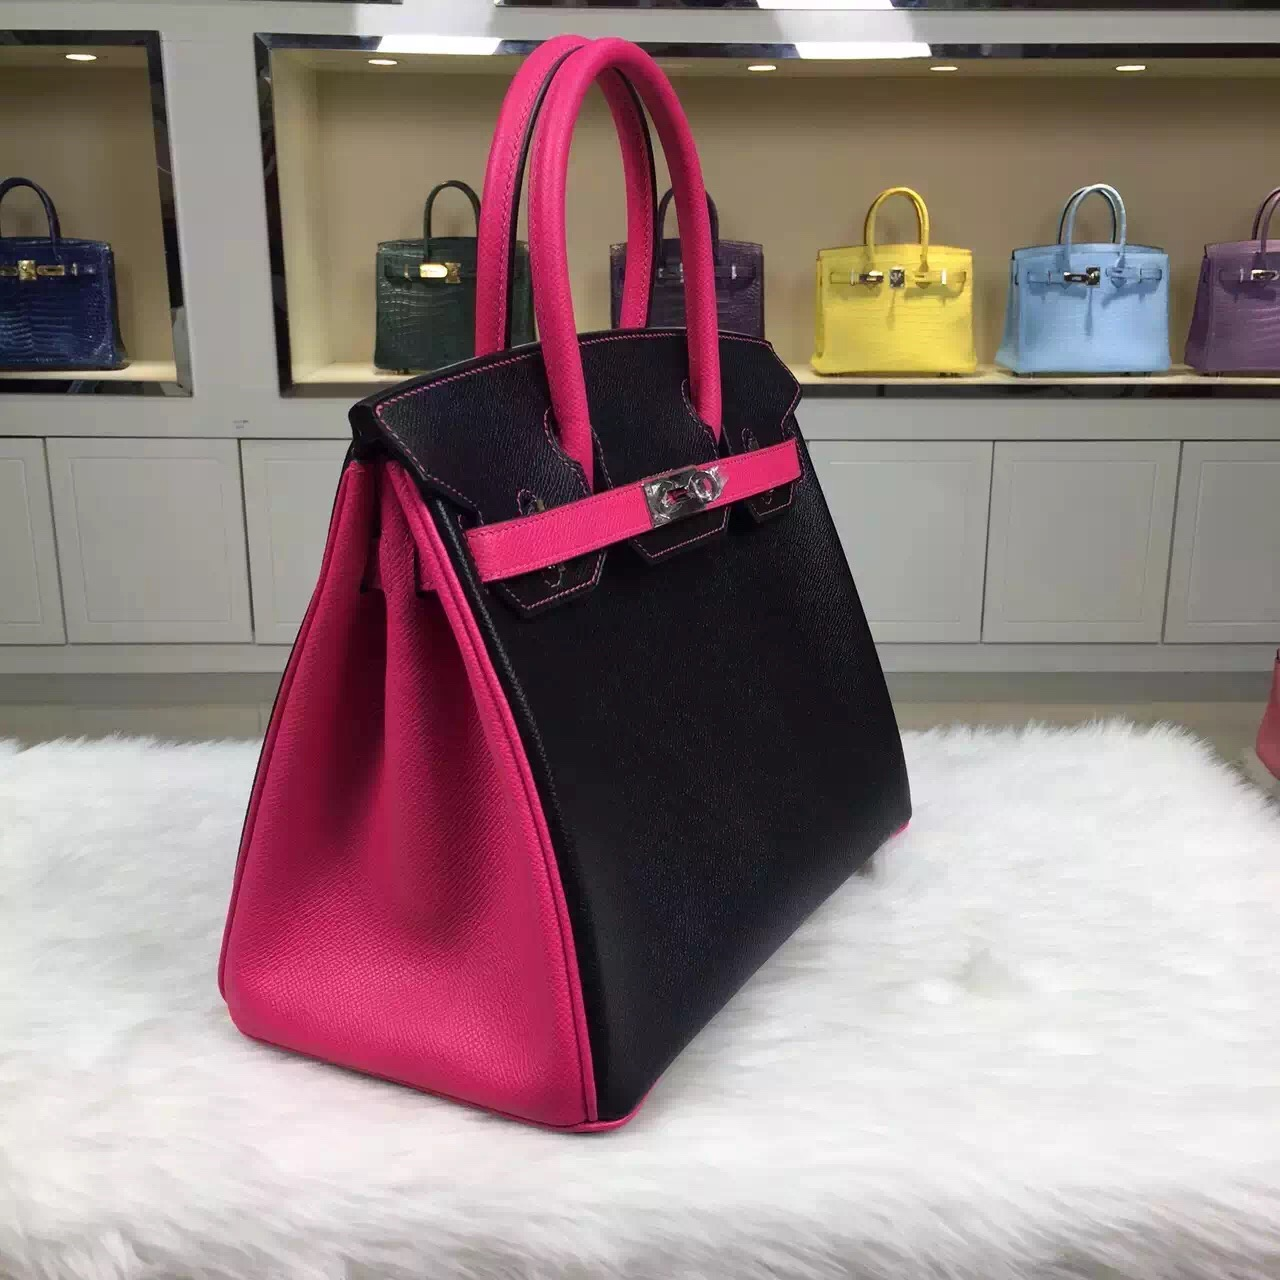 Hermes Birkin Bag30CM Two-tone Color CK89 Black/E5 Candy Pink Silver Hardware